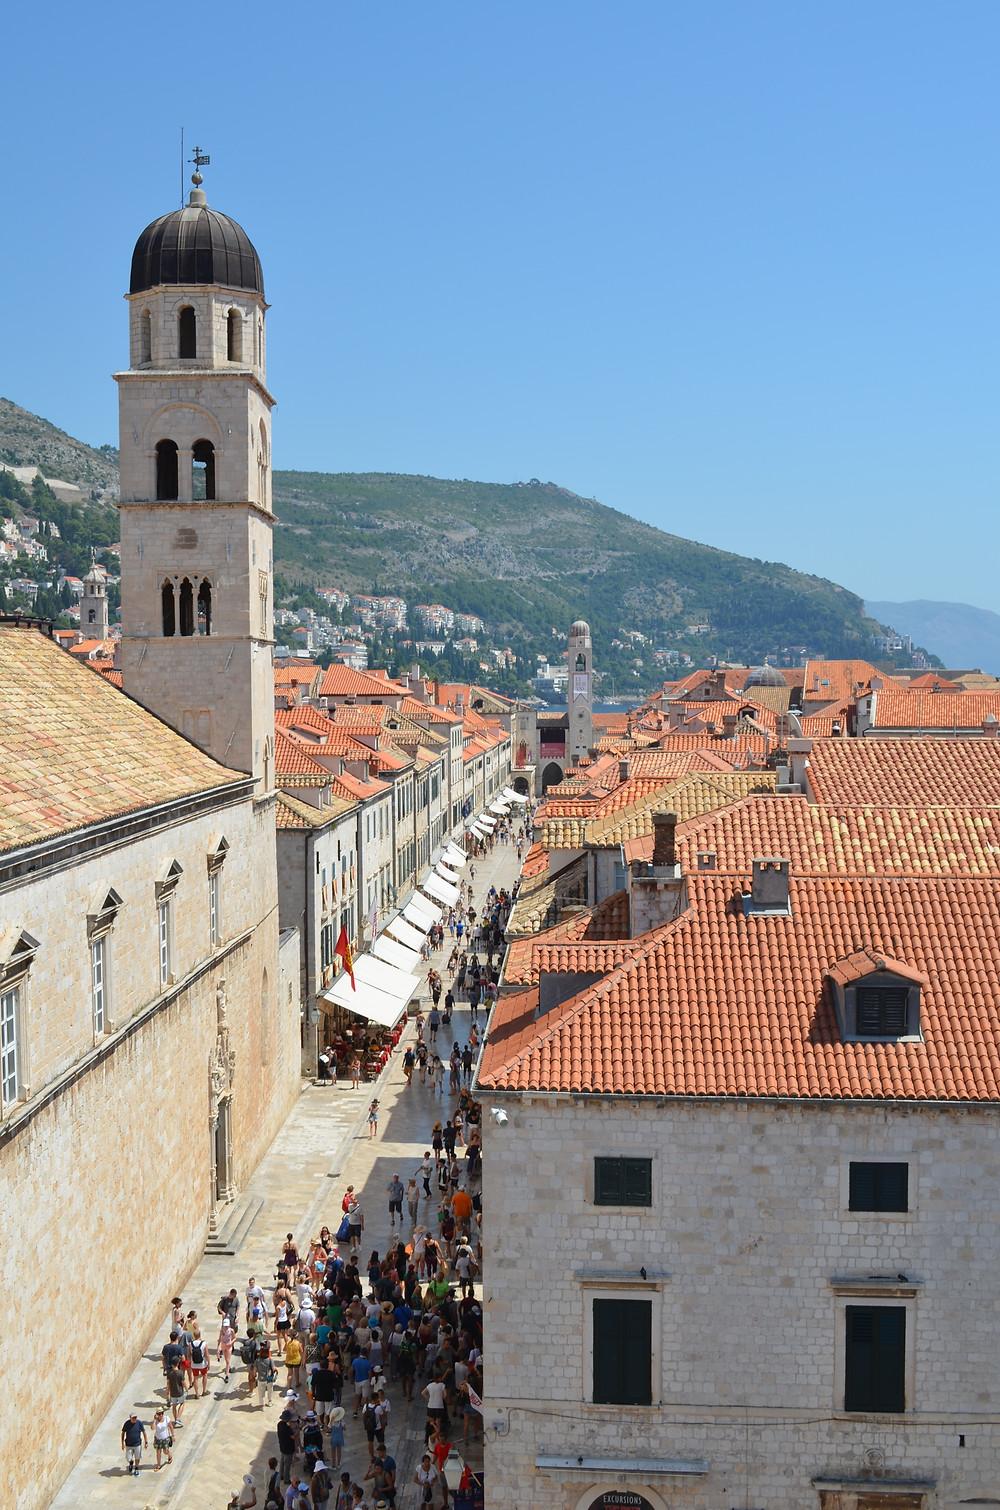 Stradun, also known as Placa, in Dubrovnik